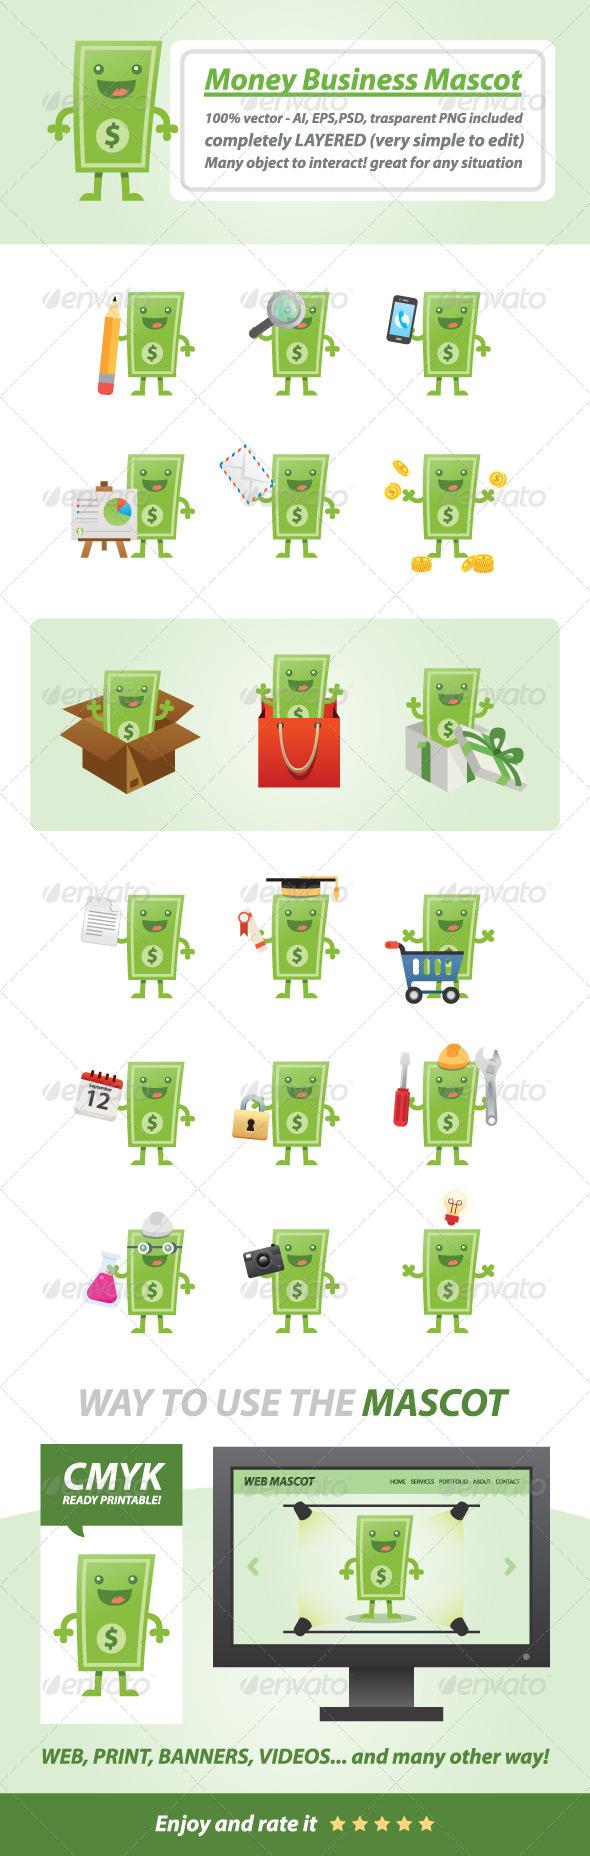 GraphicRiver Money Business Mascot 7918331